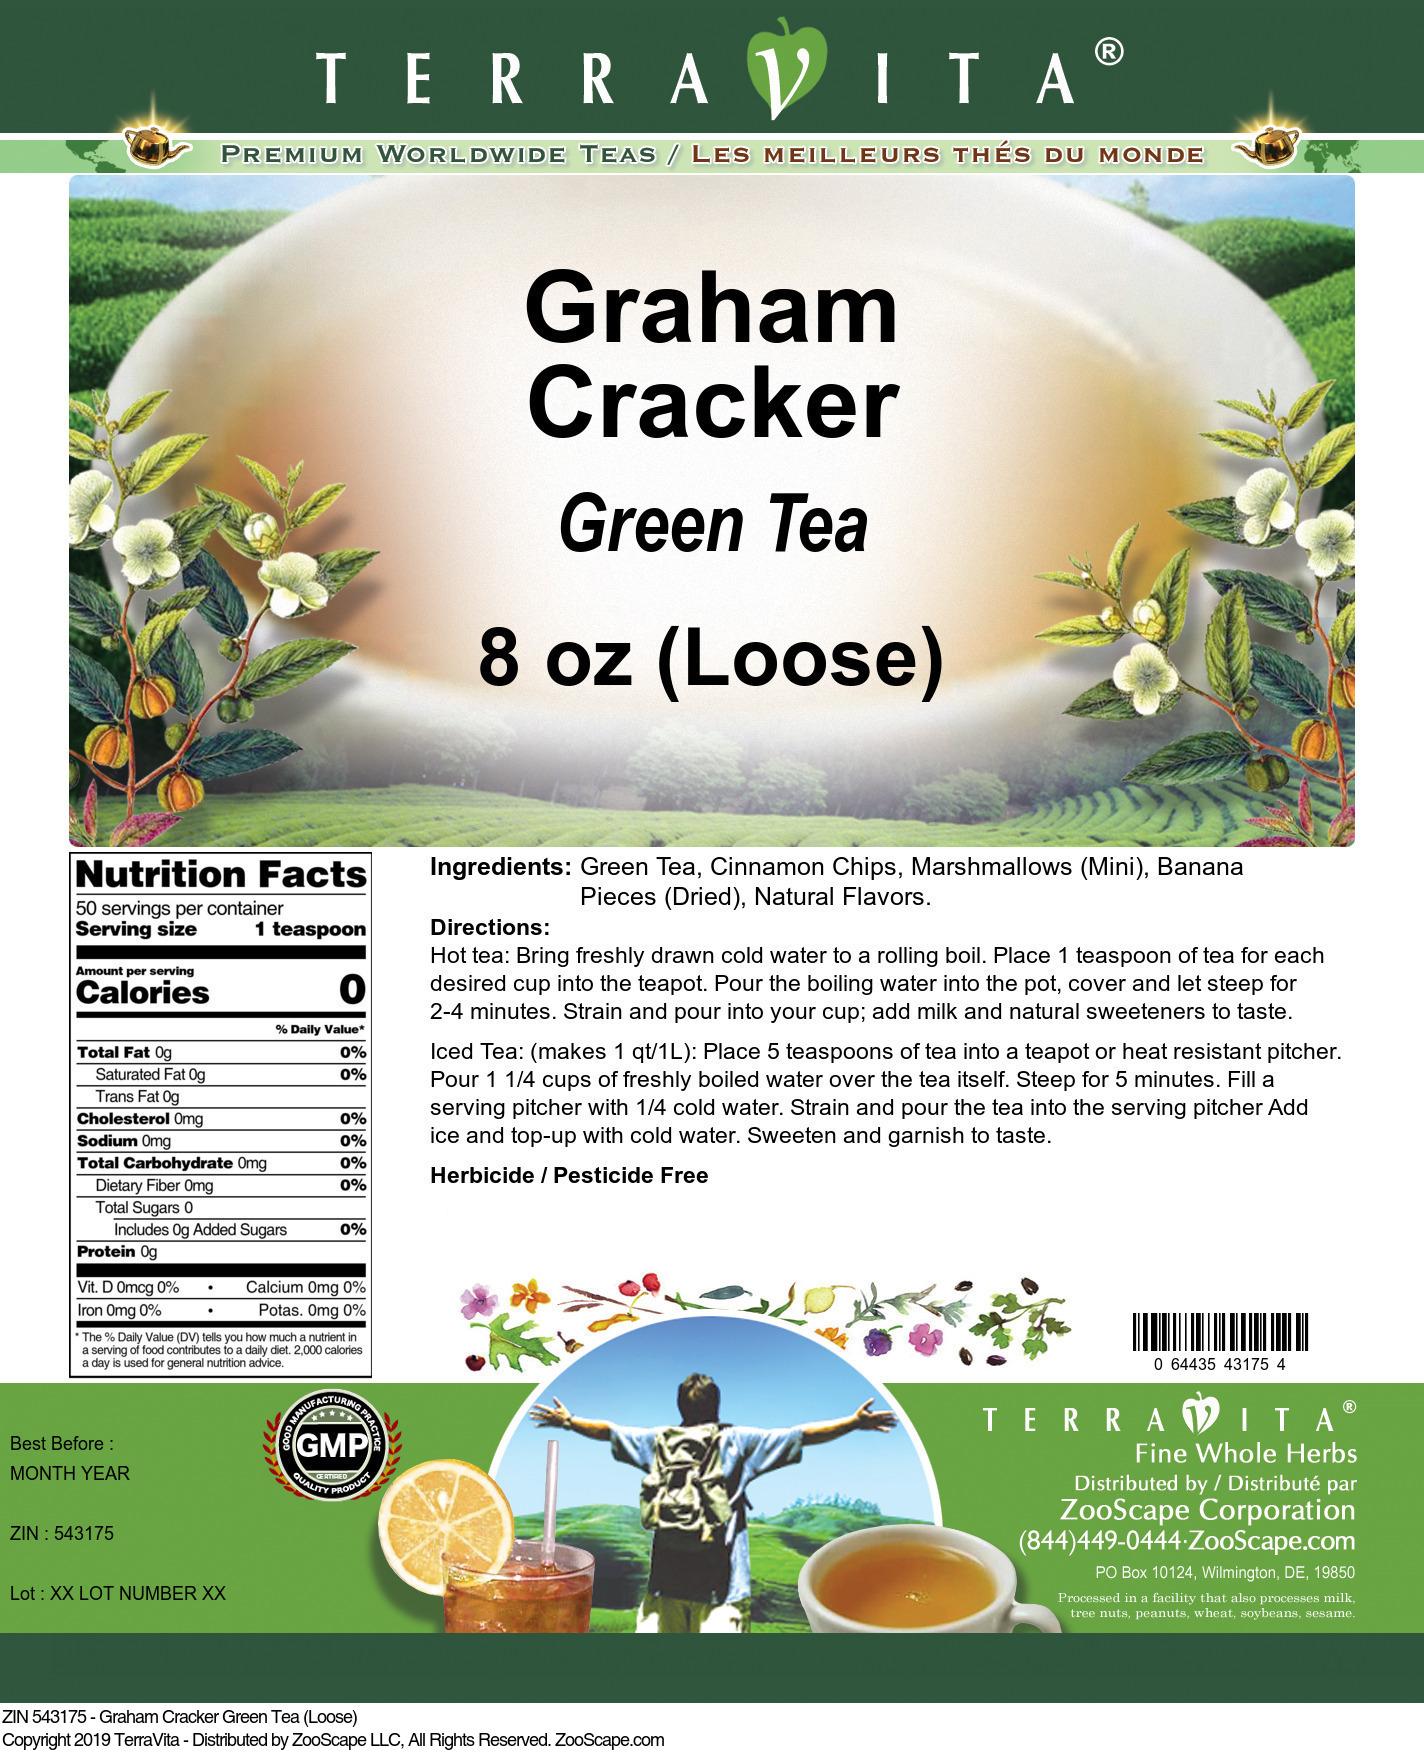 Graham Cracker Green Tea (Loose)